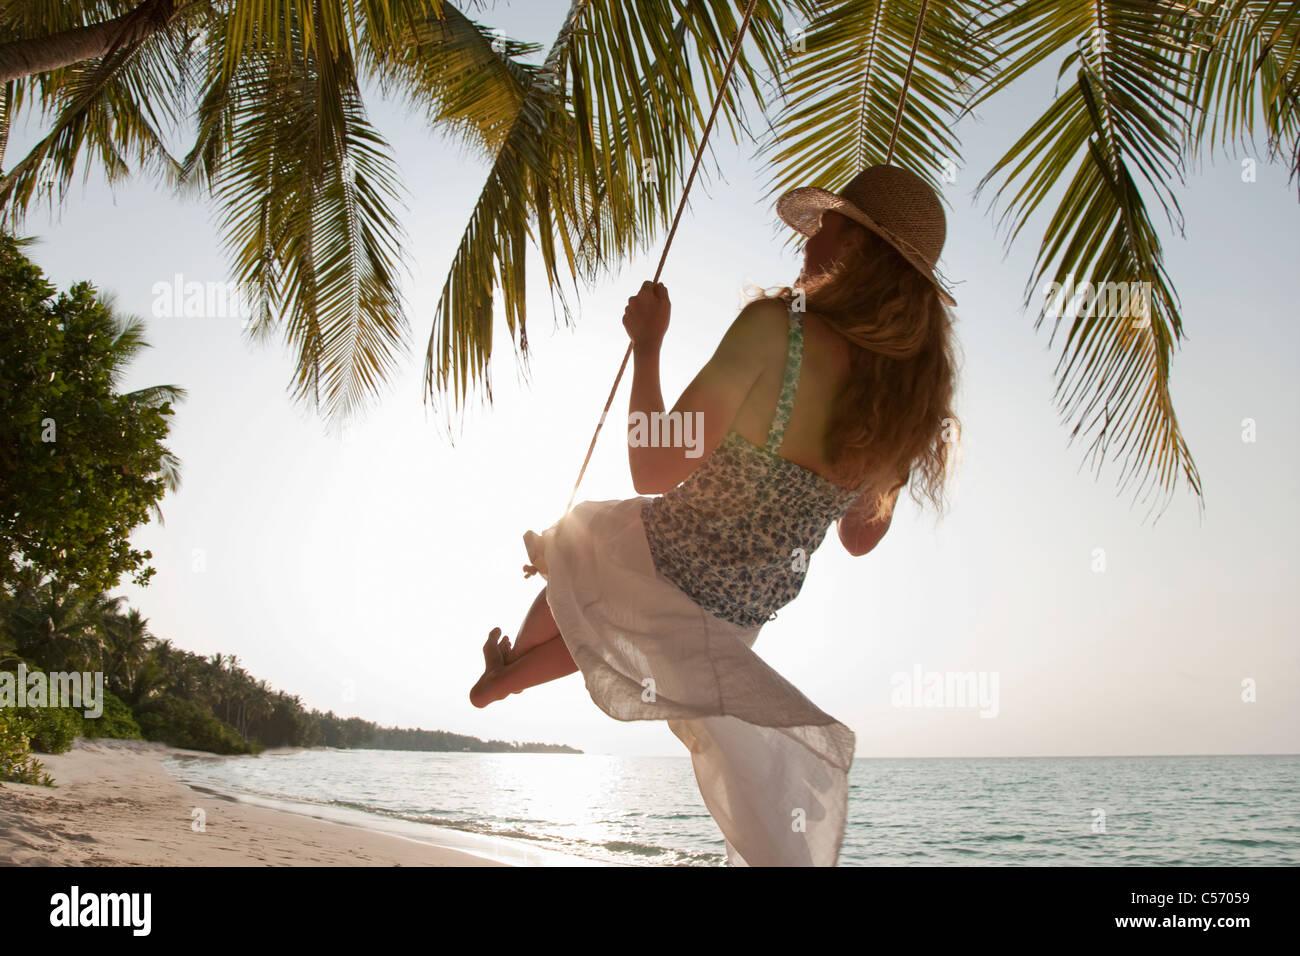 Woman swinging on tropical beach - Stock Image